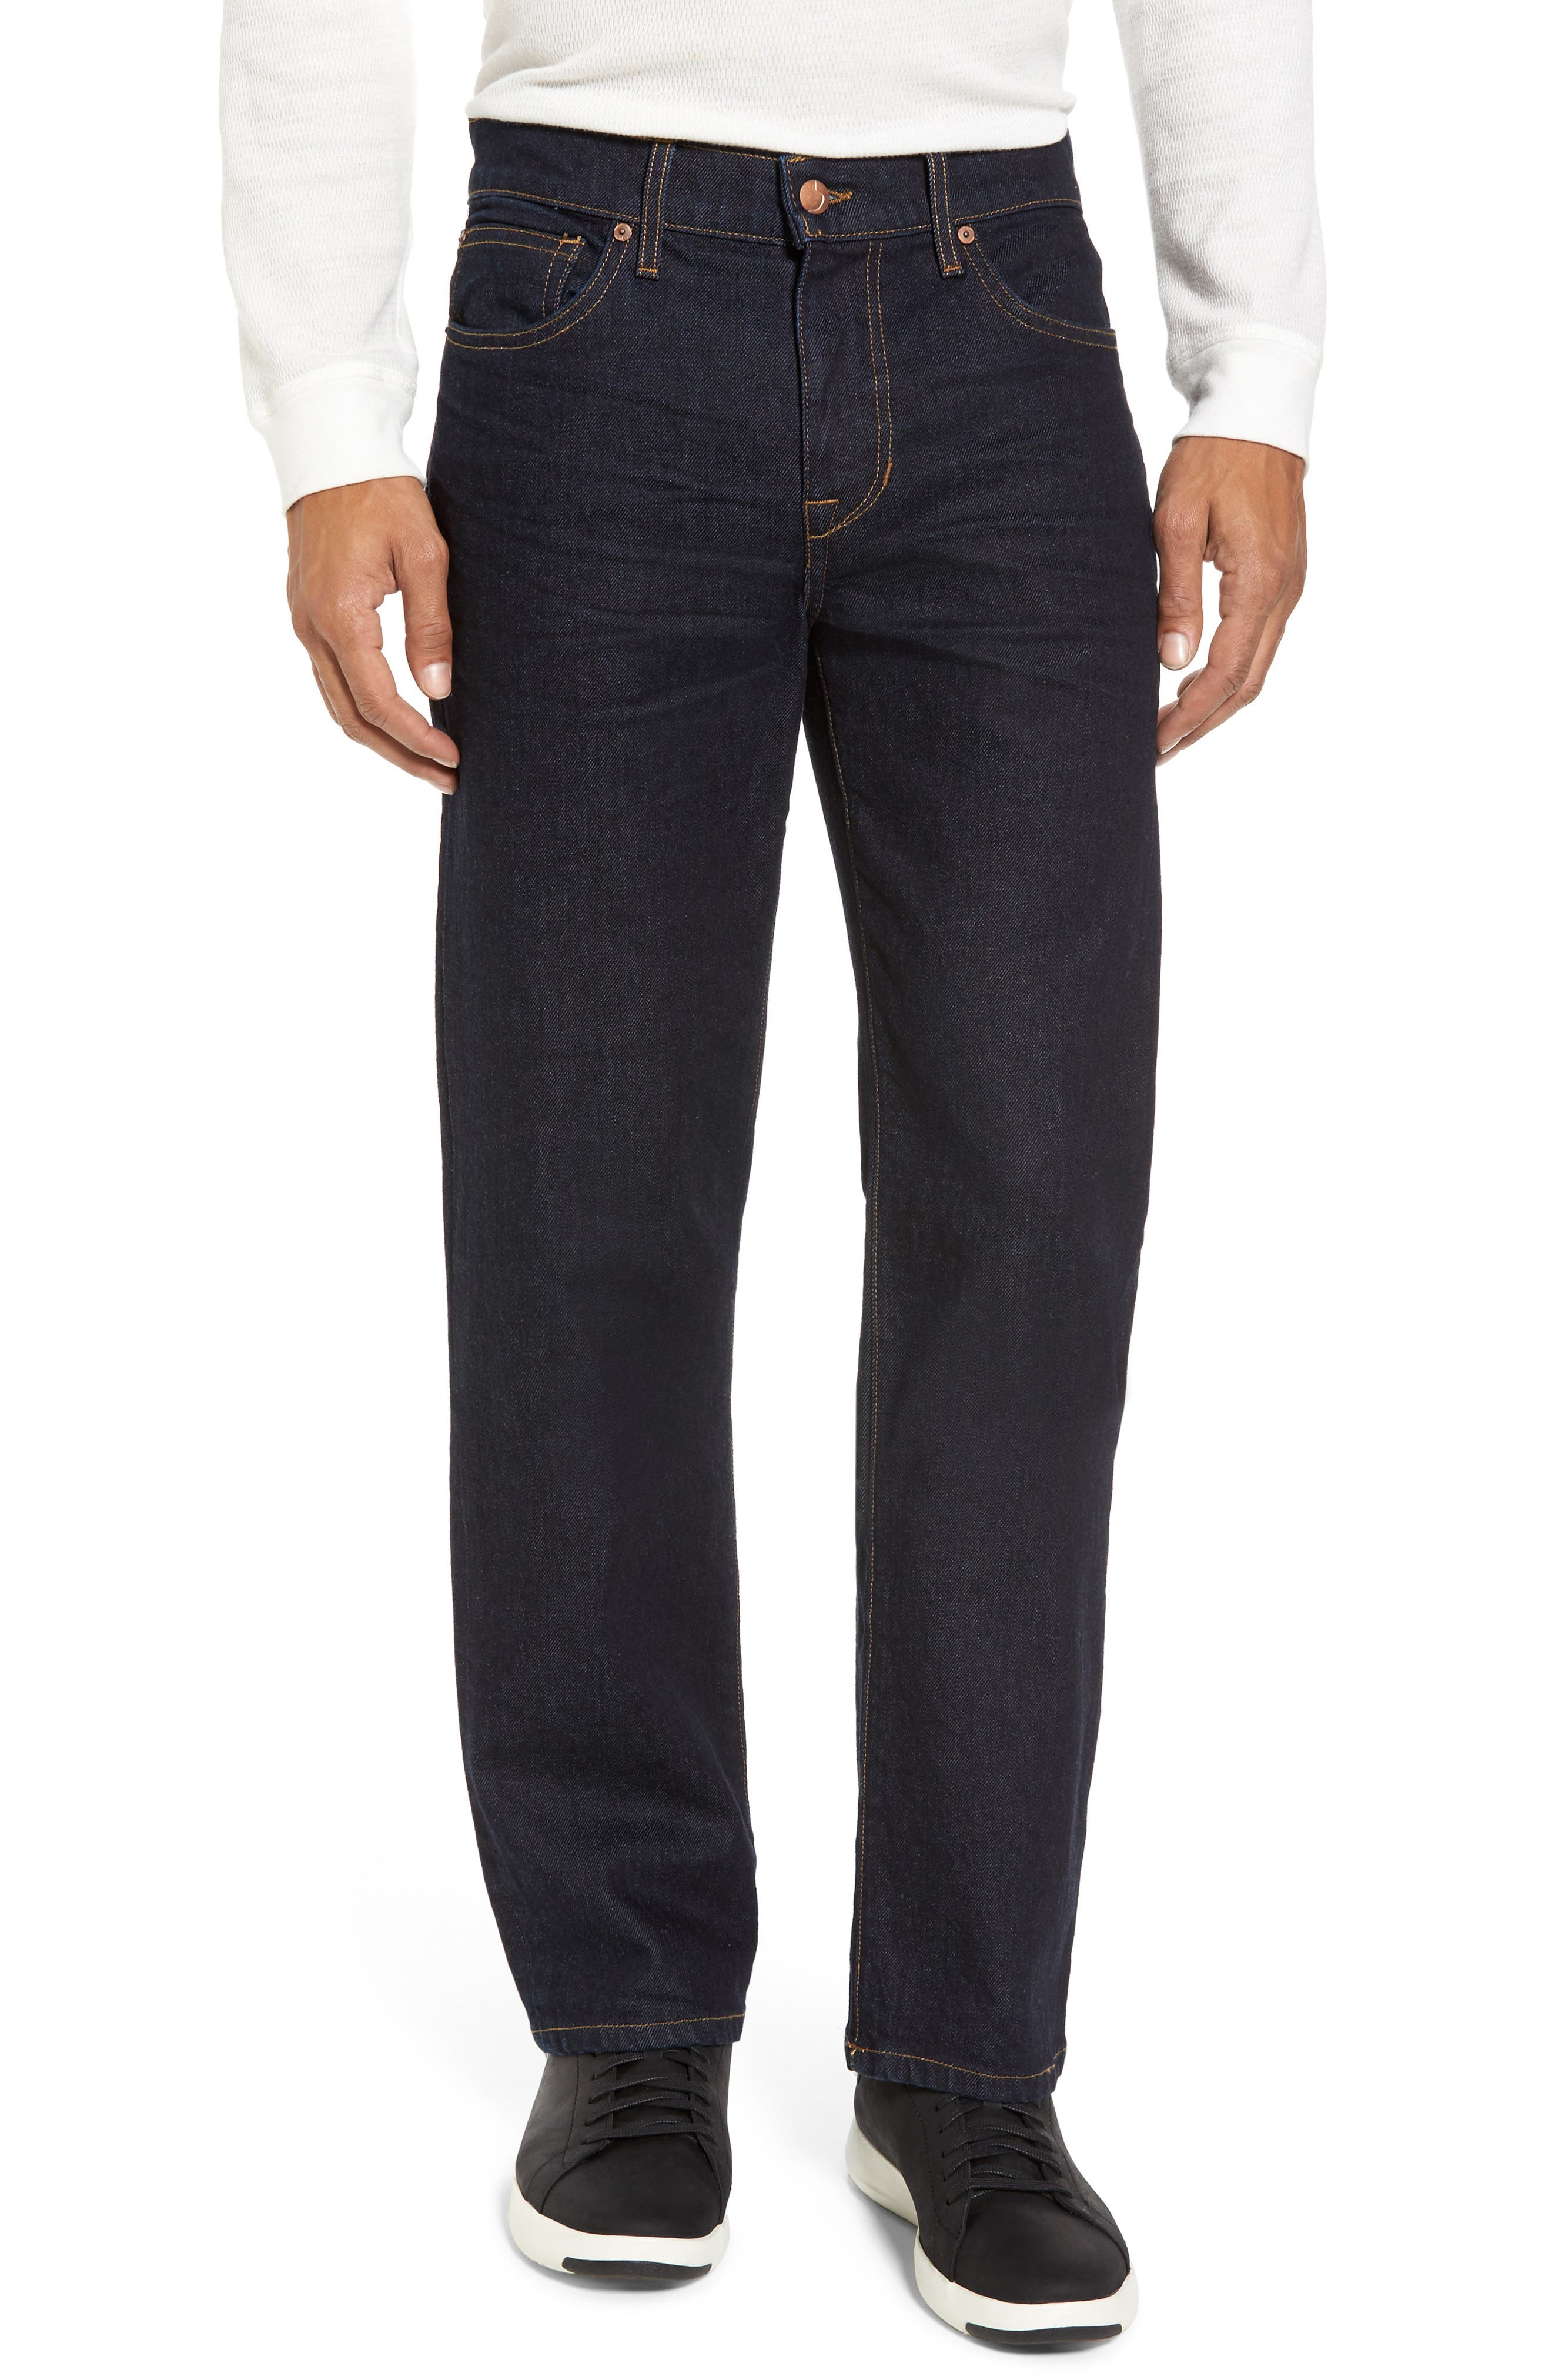 Main Image - Joe's Brixton Slim Straight Leg Jeans (Halford)